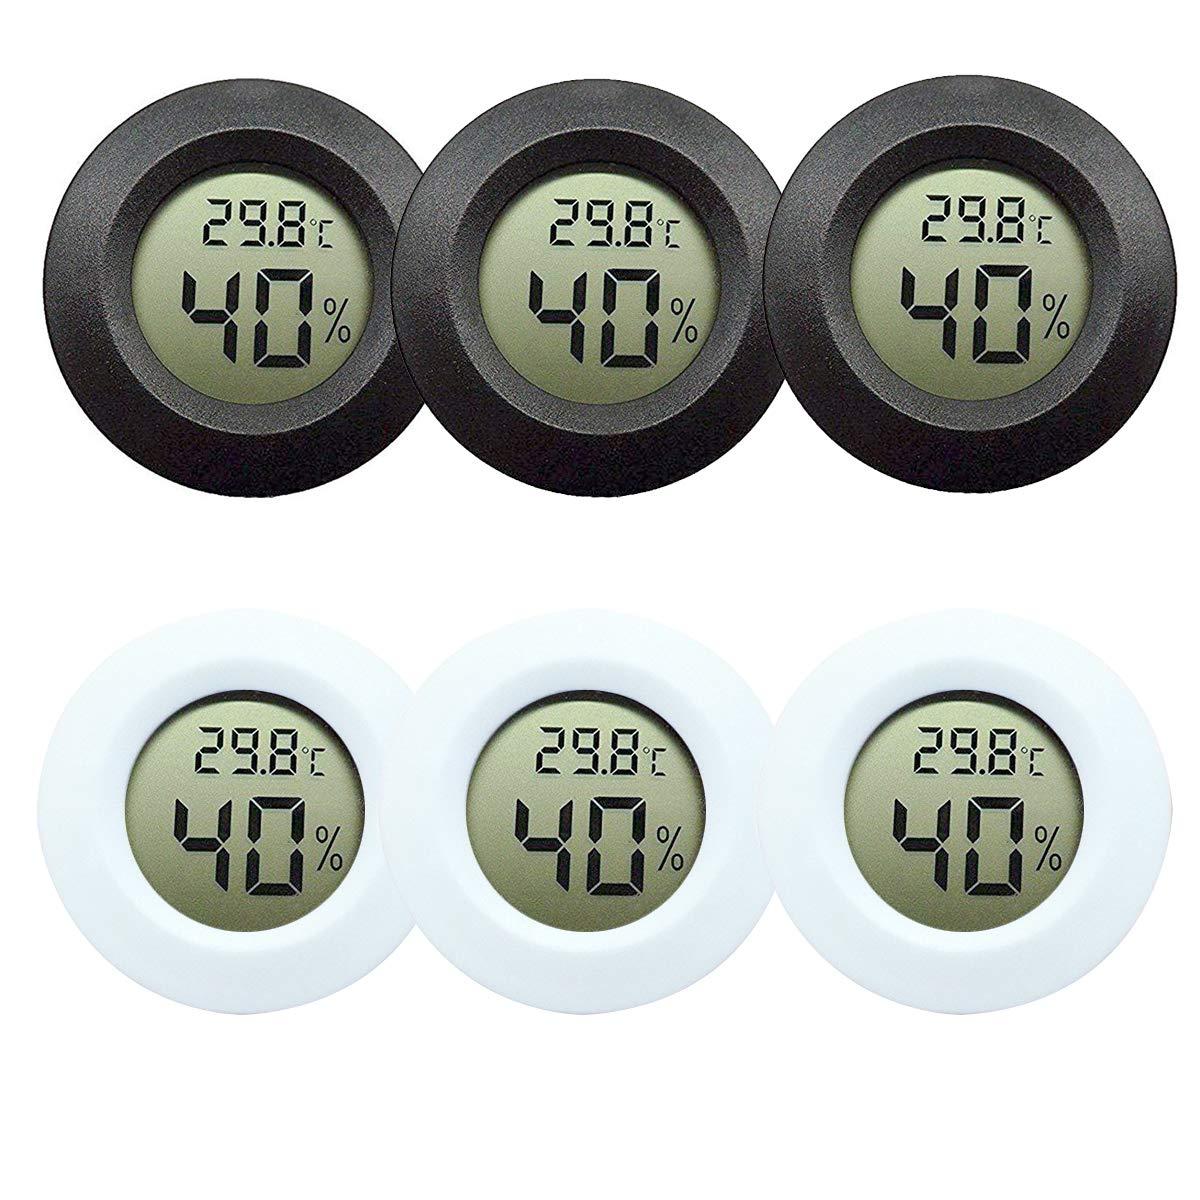 Mini Digital Temperature Humidity Meter Gauge Shyshing Thermometer Hygrometer LCD Degree Centigrade (C) Display Indoor (1Pc) Shyshining